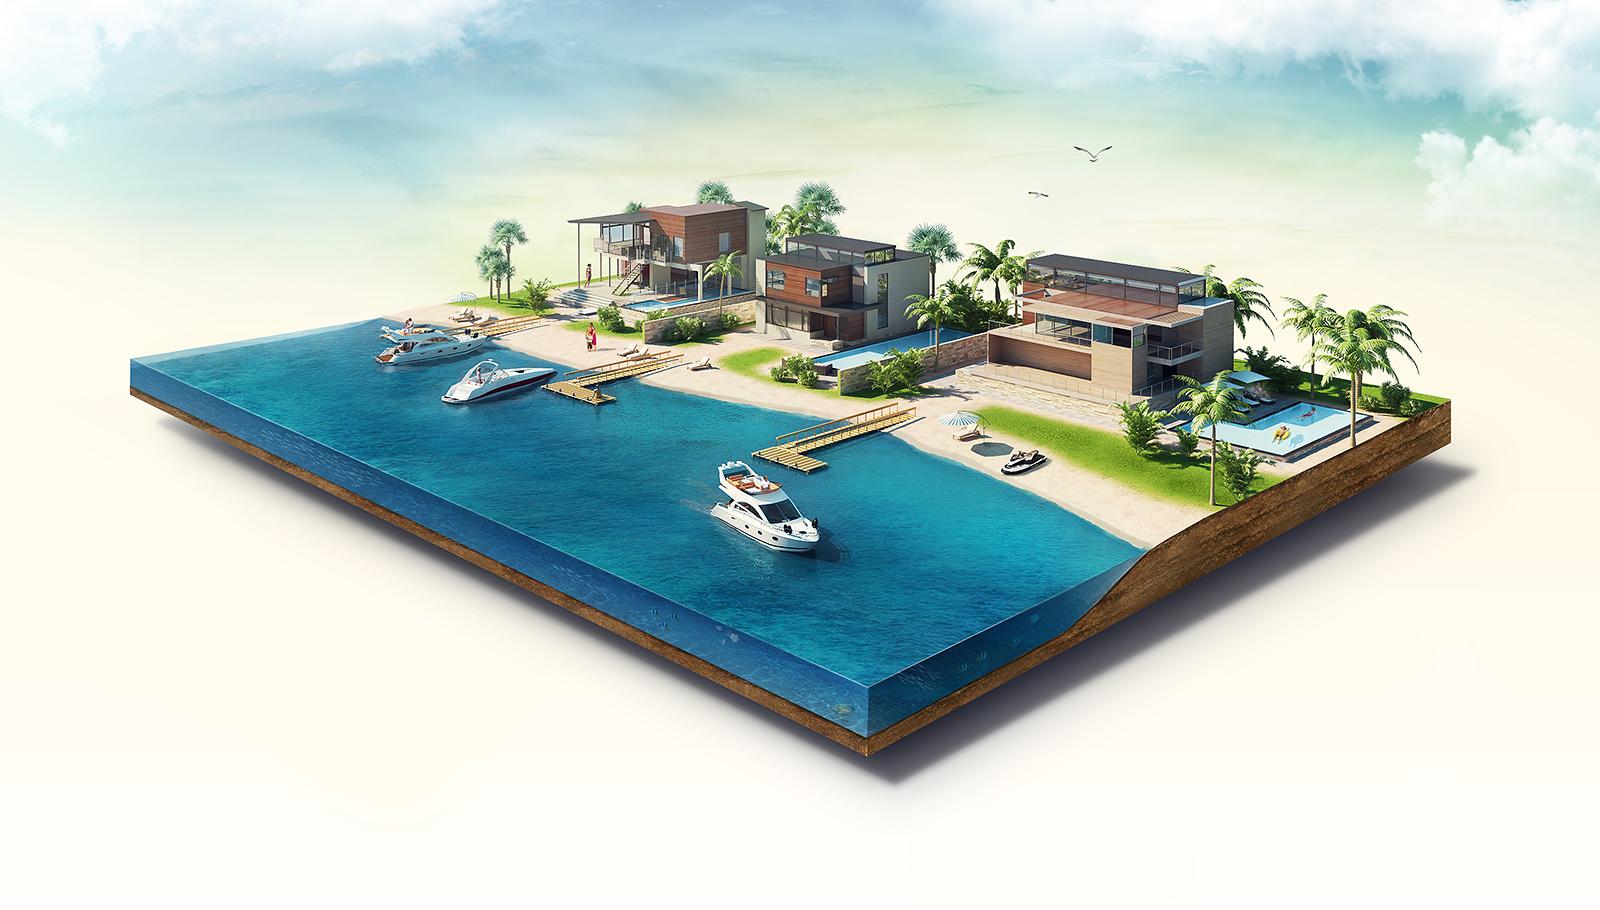 Beautiful shore 3d illustration